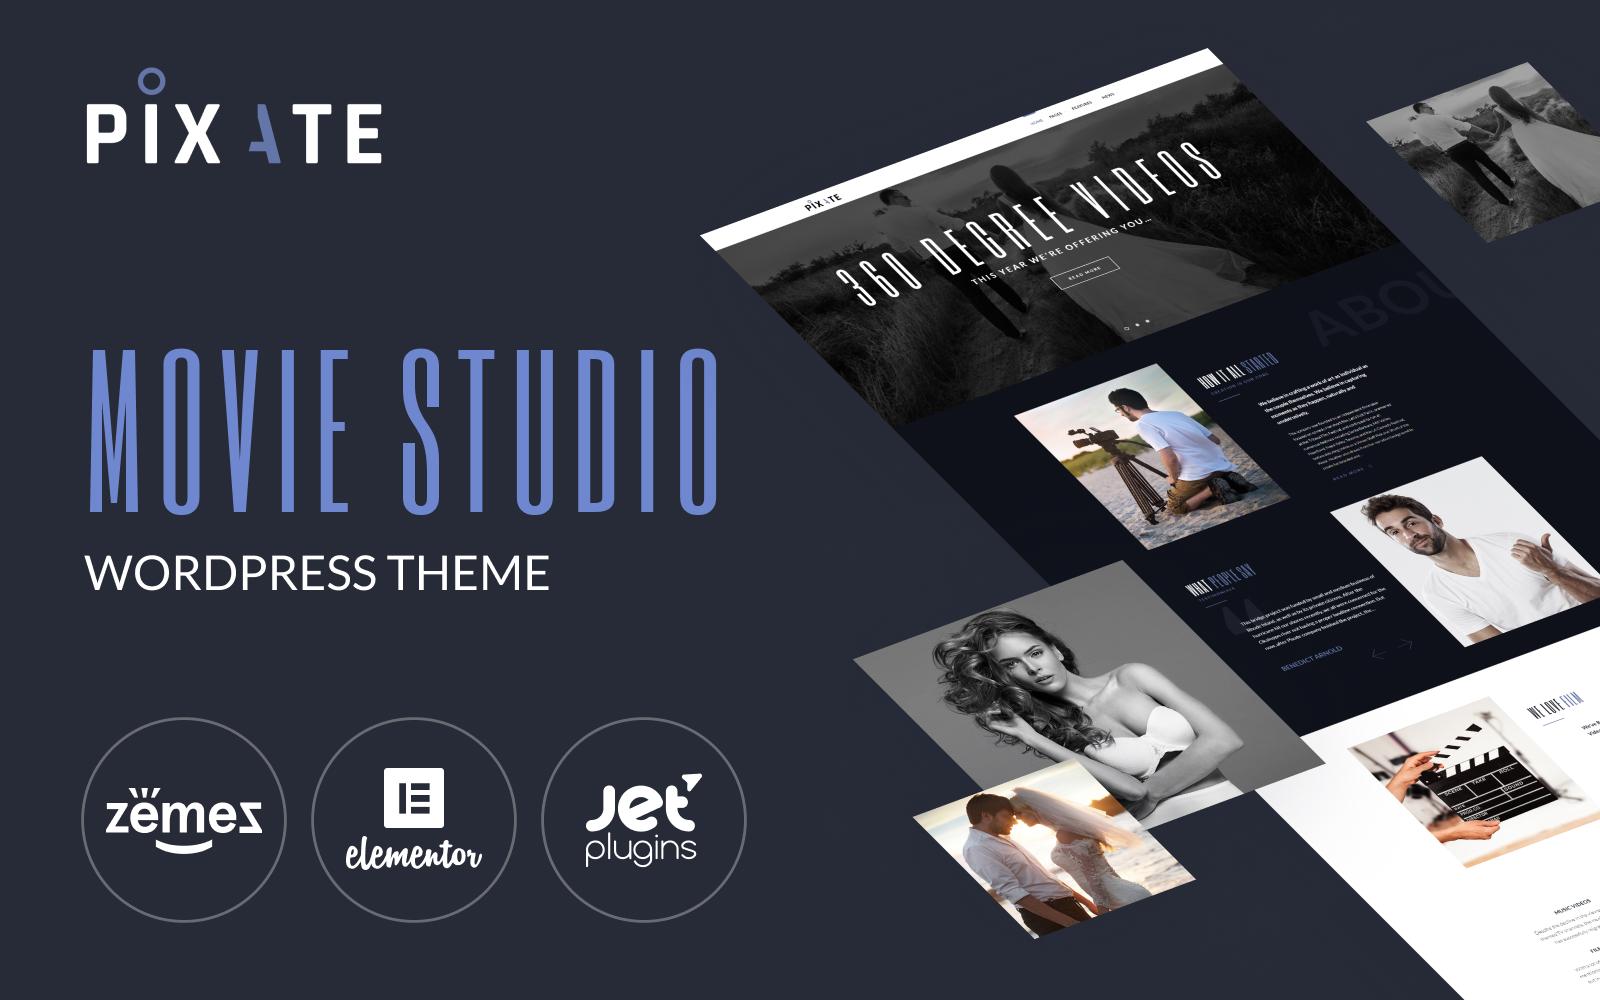 """Pixate - Movie Studio WordPress Theme"" 响应式WordPress模板 #65159"